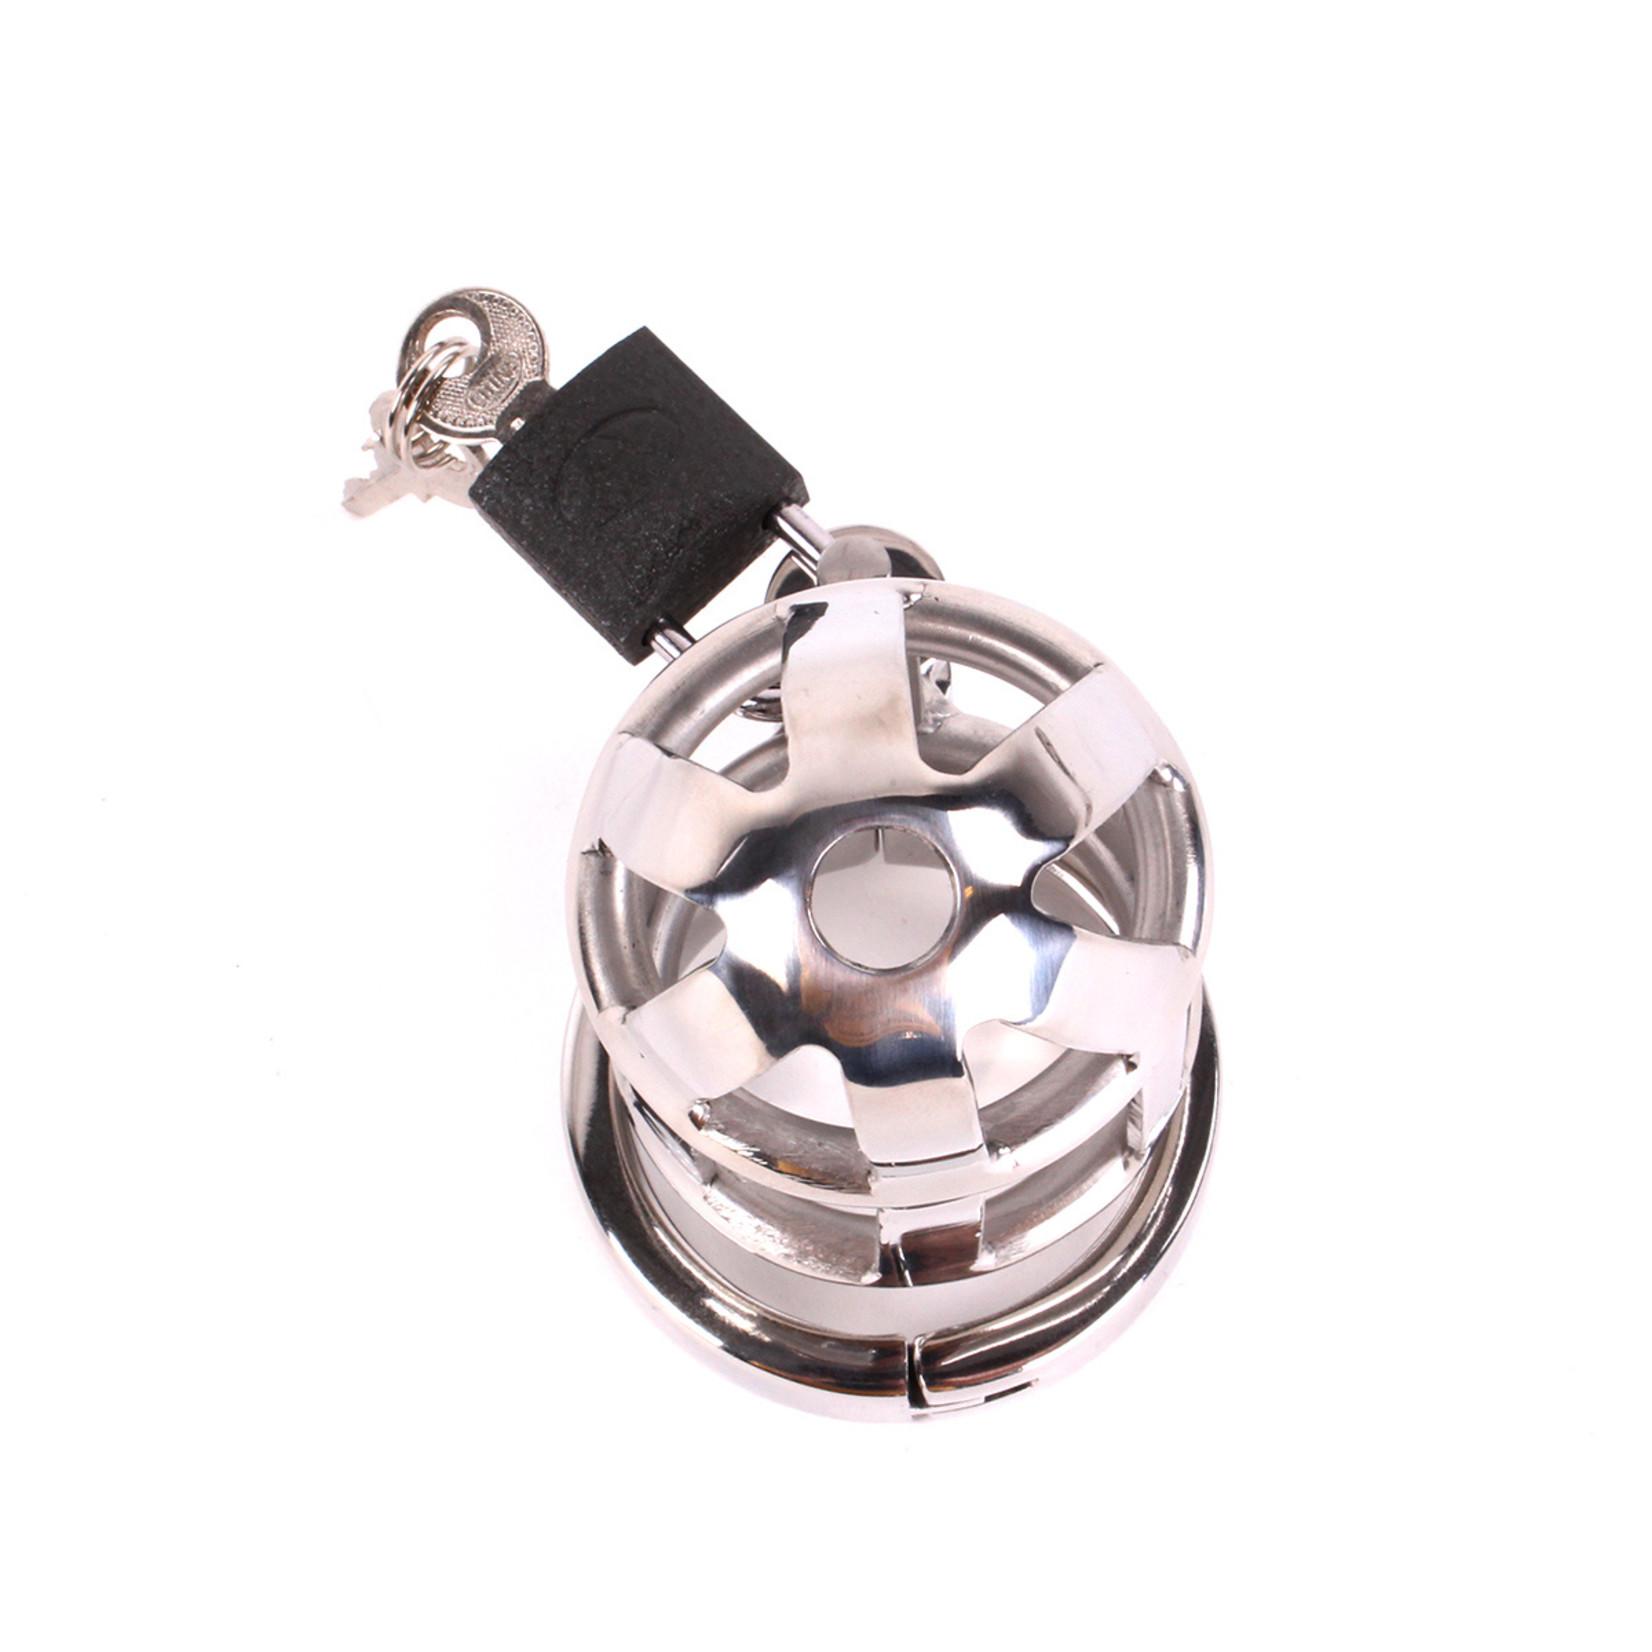 KIOTOS Steel Chastity Cage DeLuxe 6.5 cm